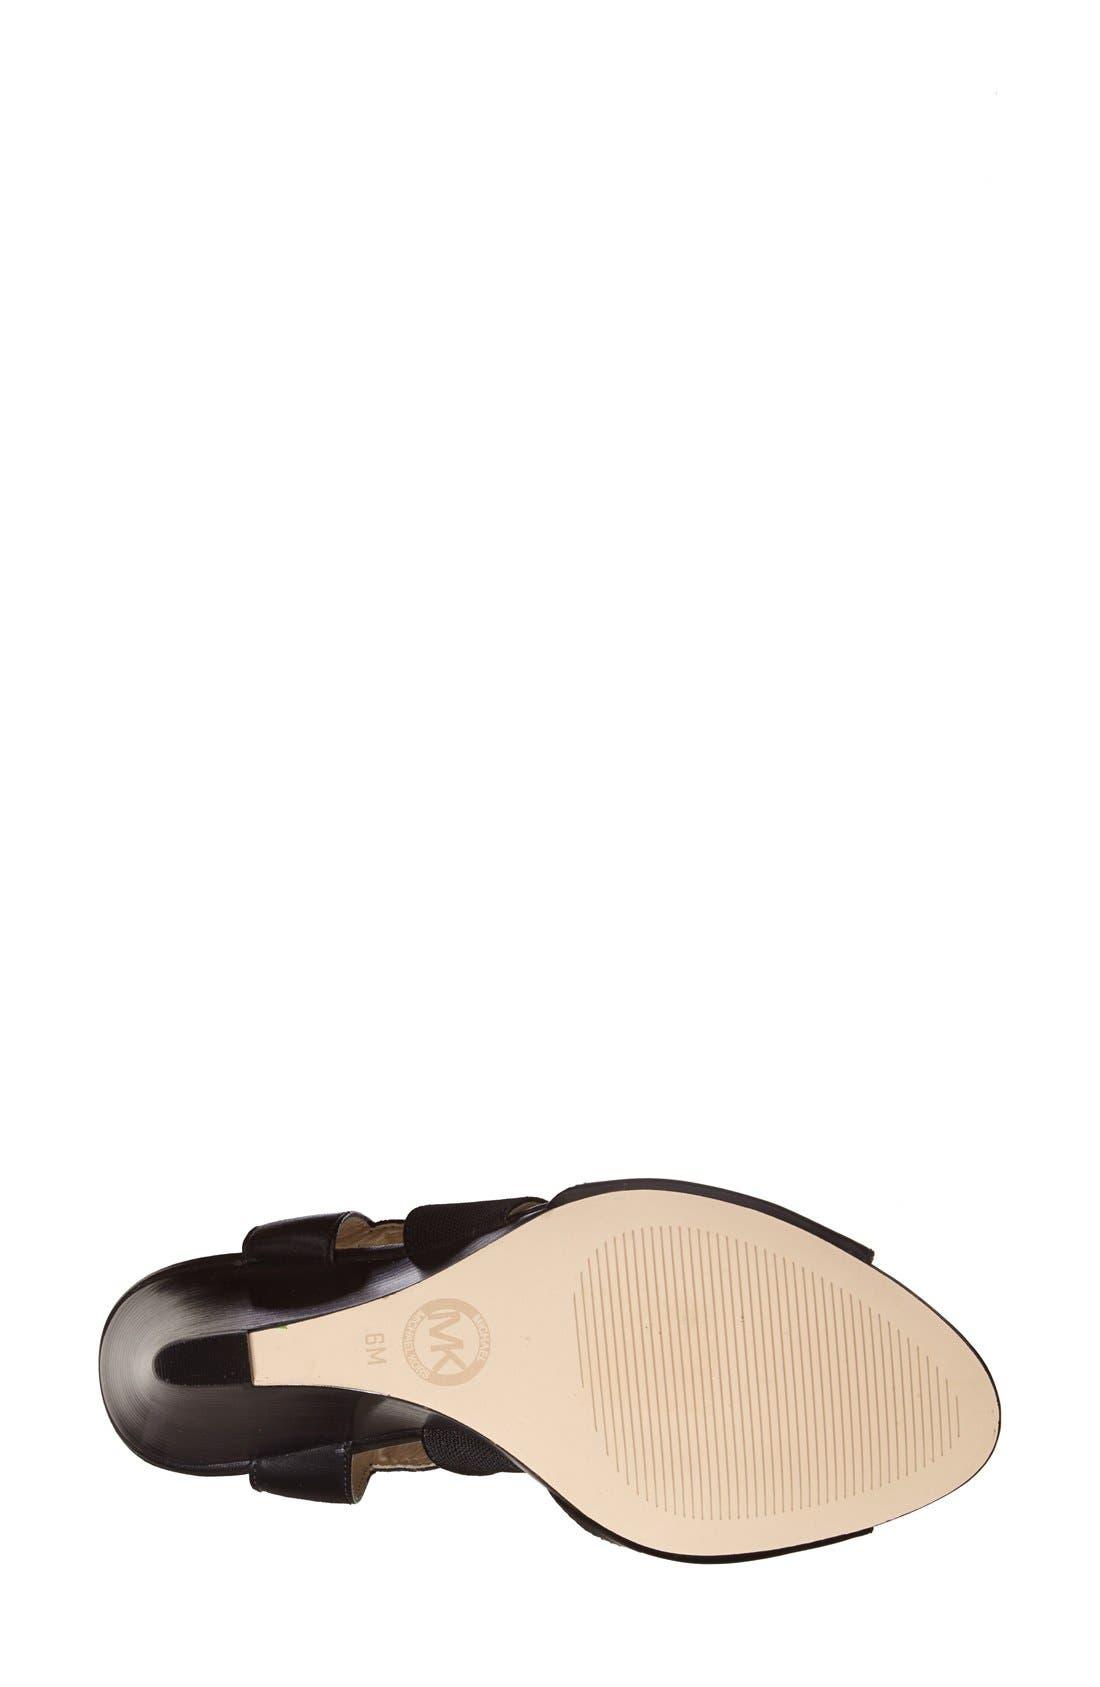 Alternate Image 3  - MICHAEL Michael Kors 'Meadow' Wedge Sandal (Women)